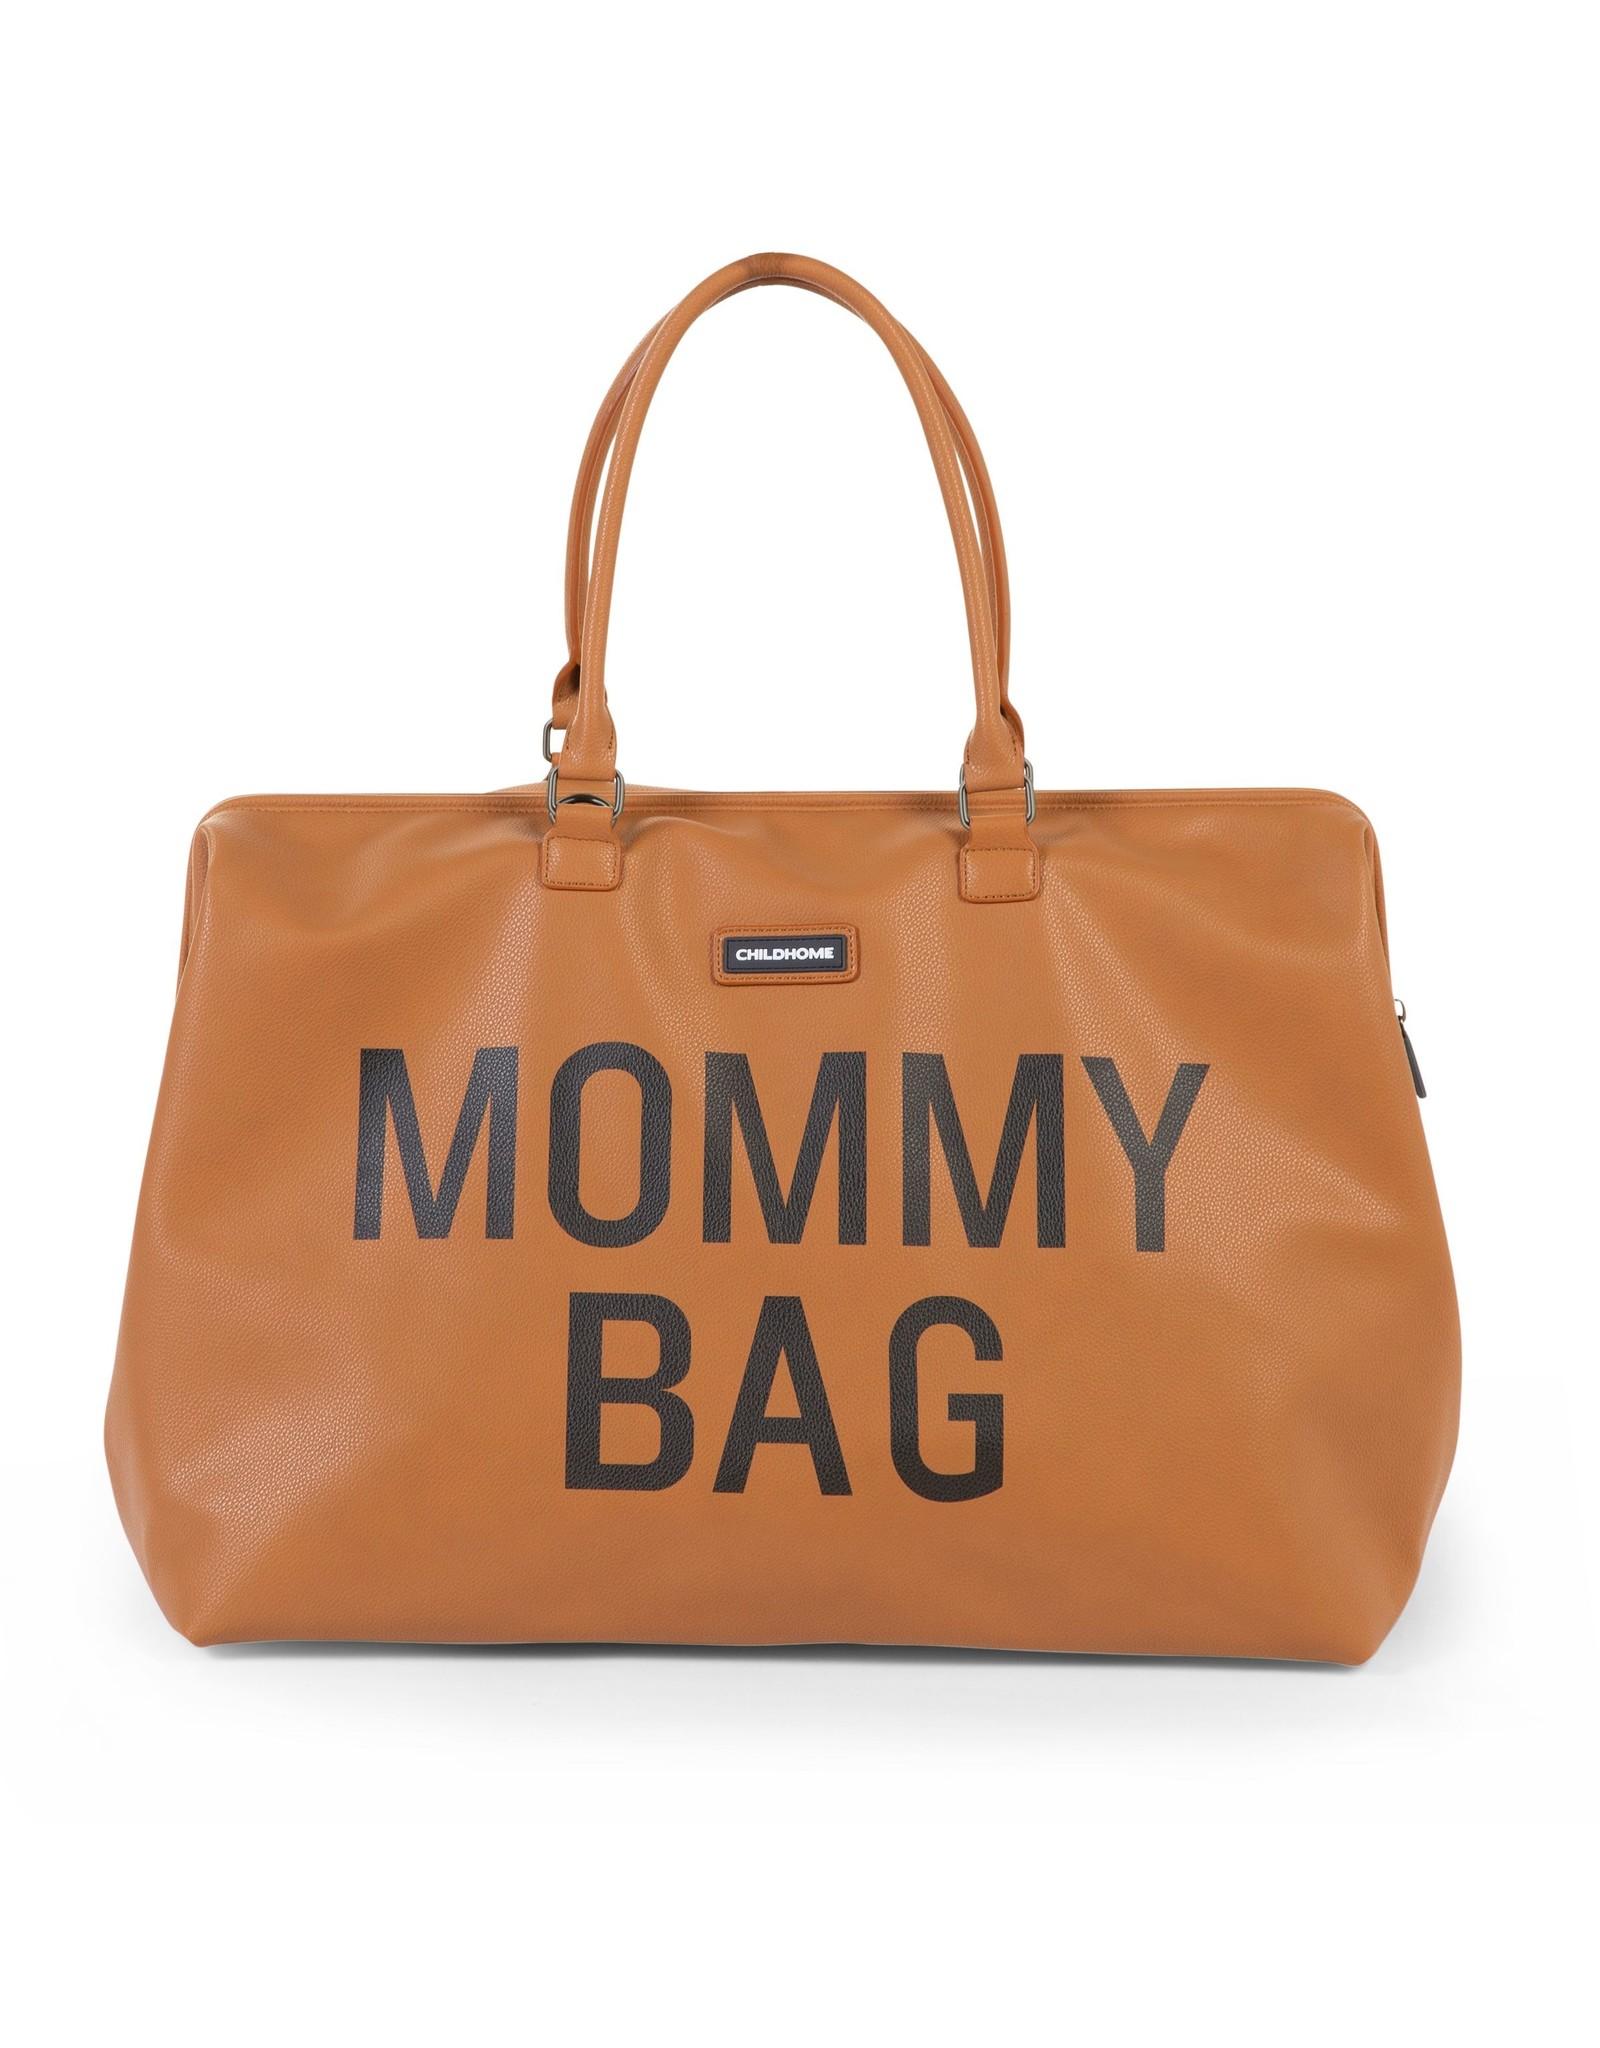 Childhome Mommy bag Simili cuir